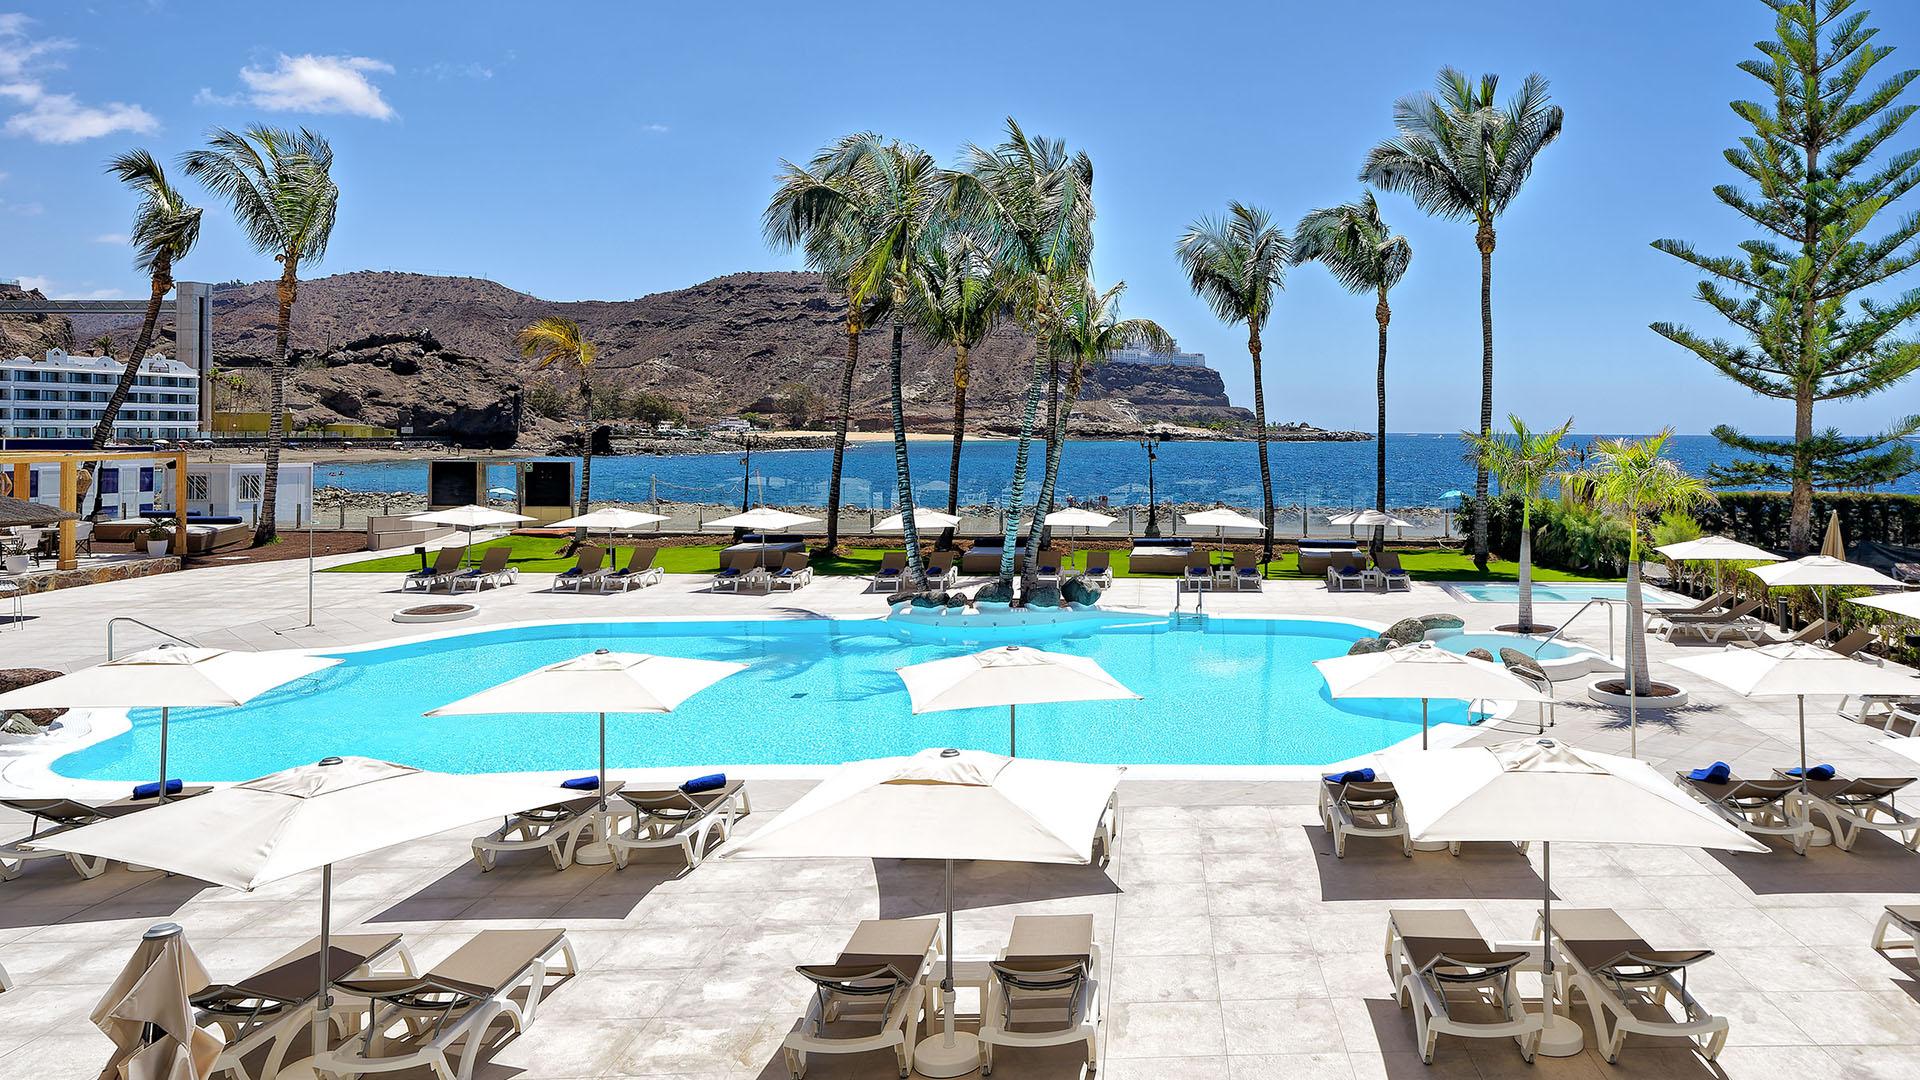 labranda-costa-mogan-hotel-gran-canaria 3639